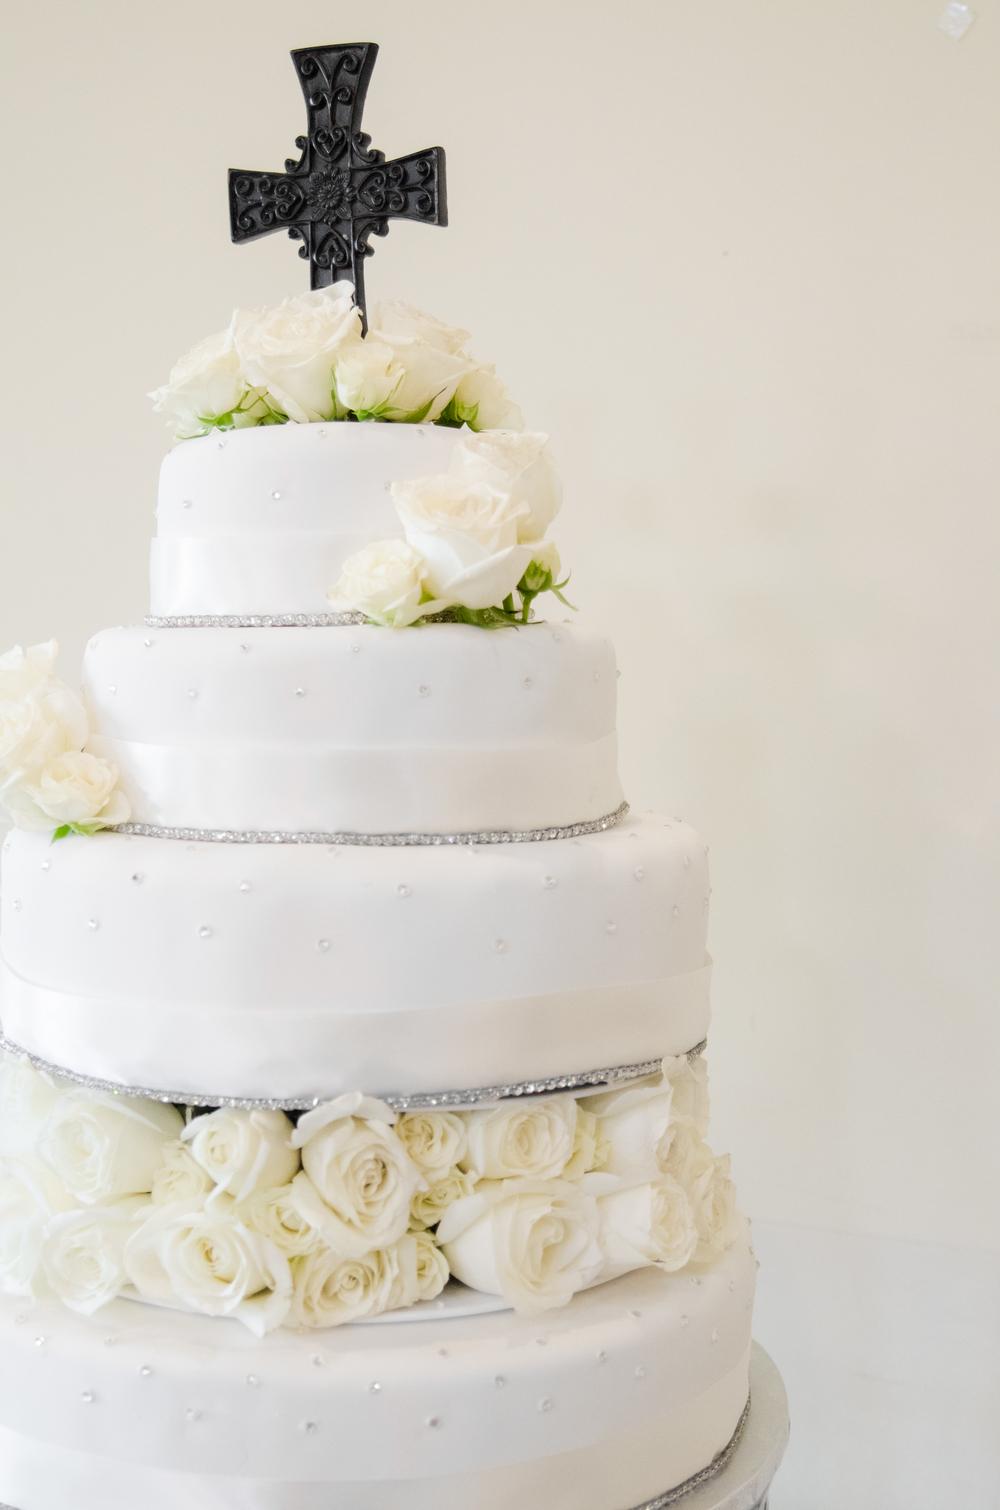 Cake-7643.jpg